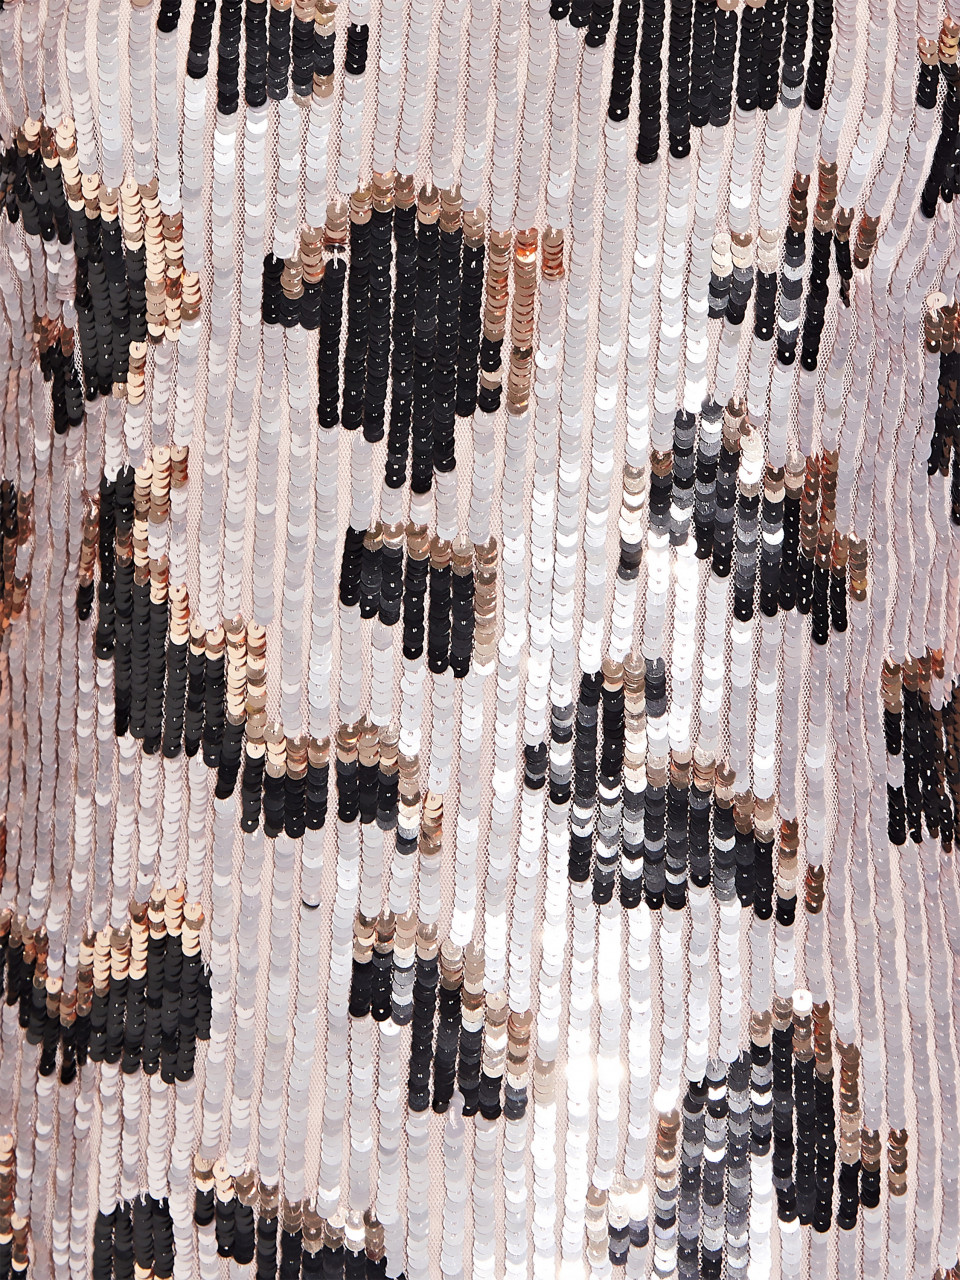 Bead mesh dress